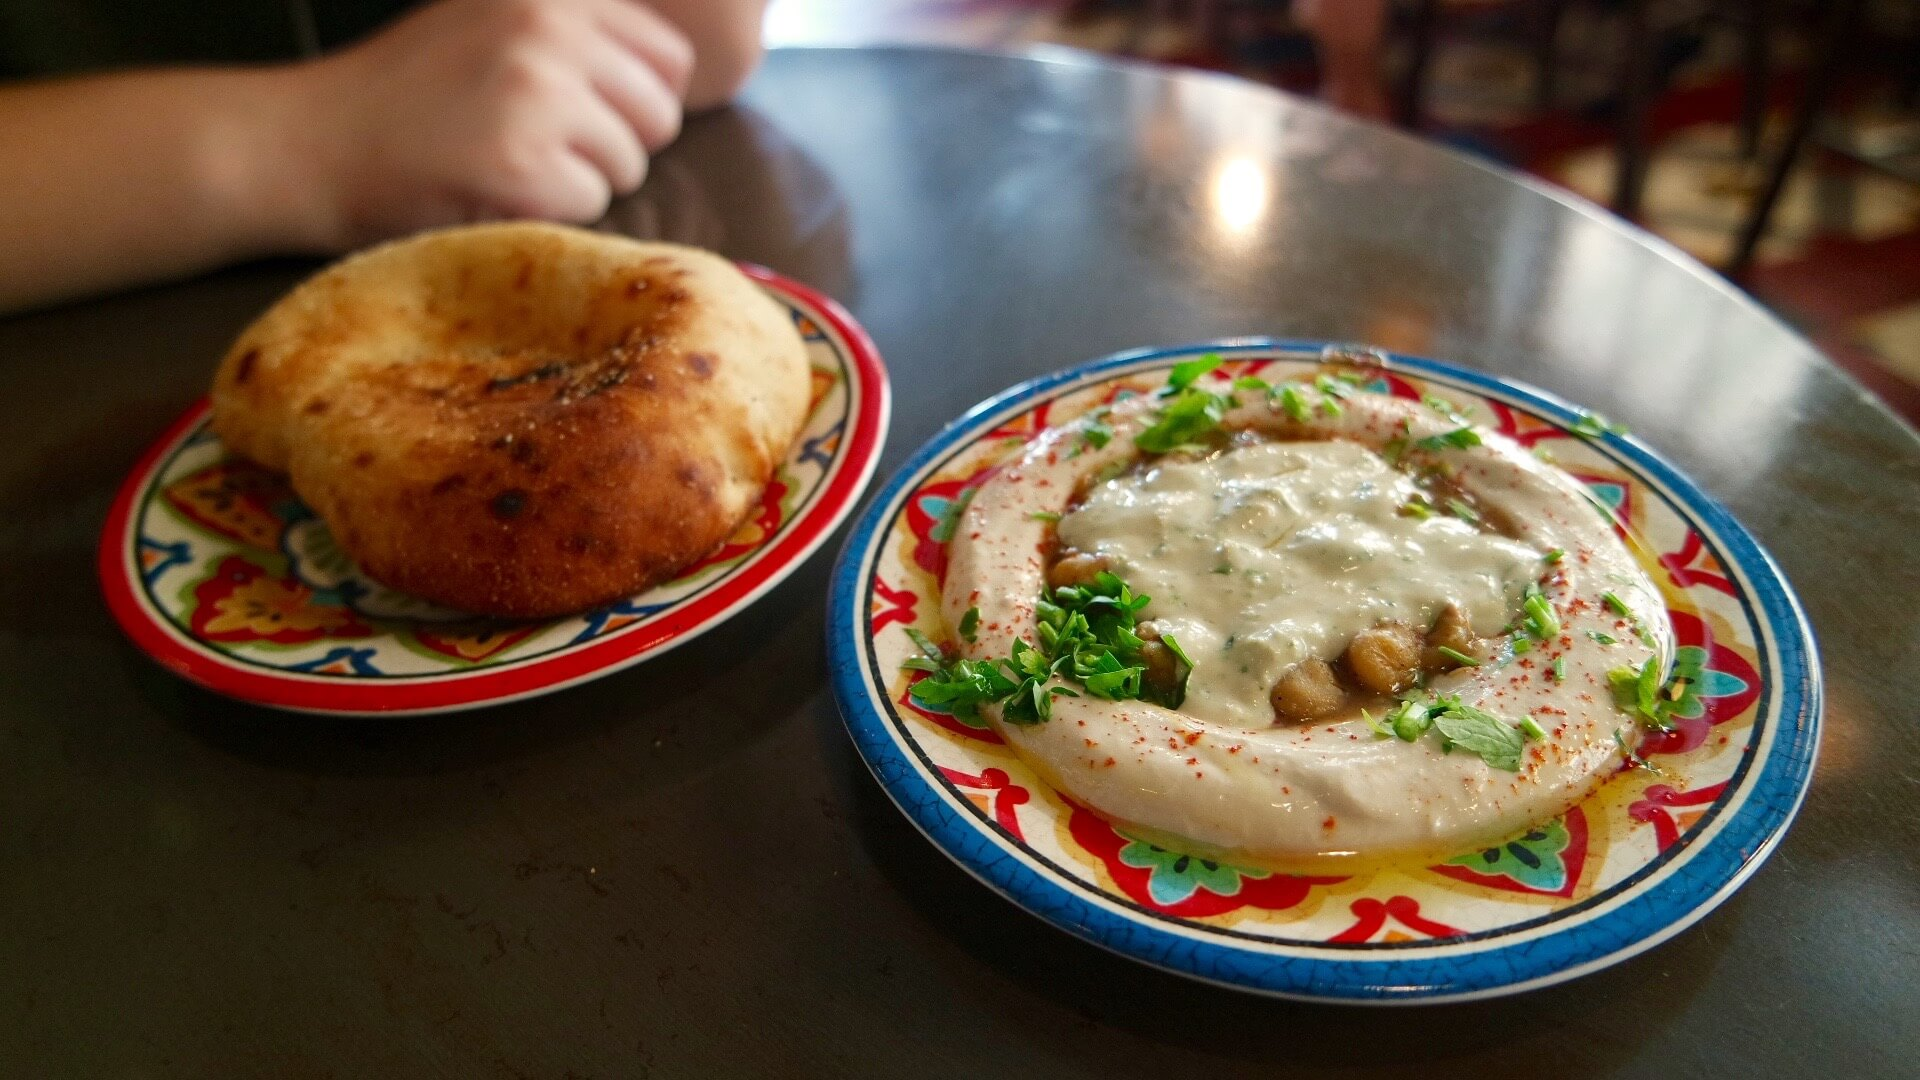 A photo of an Israeli food combination of Hummus and Pita